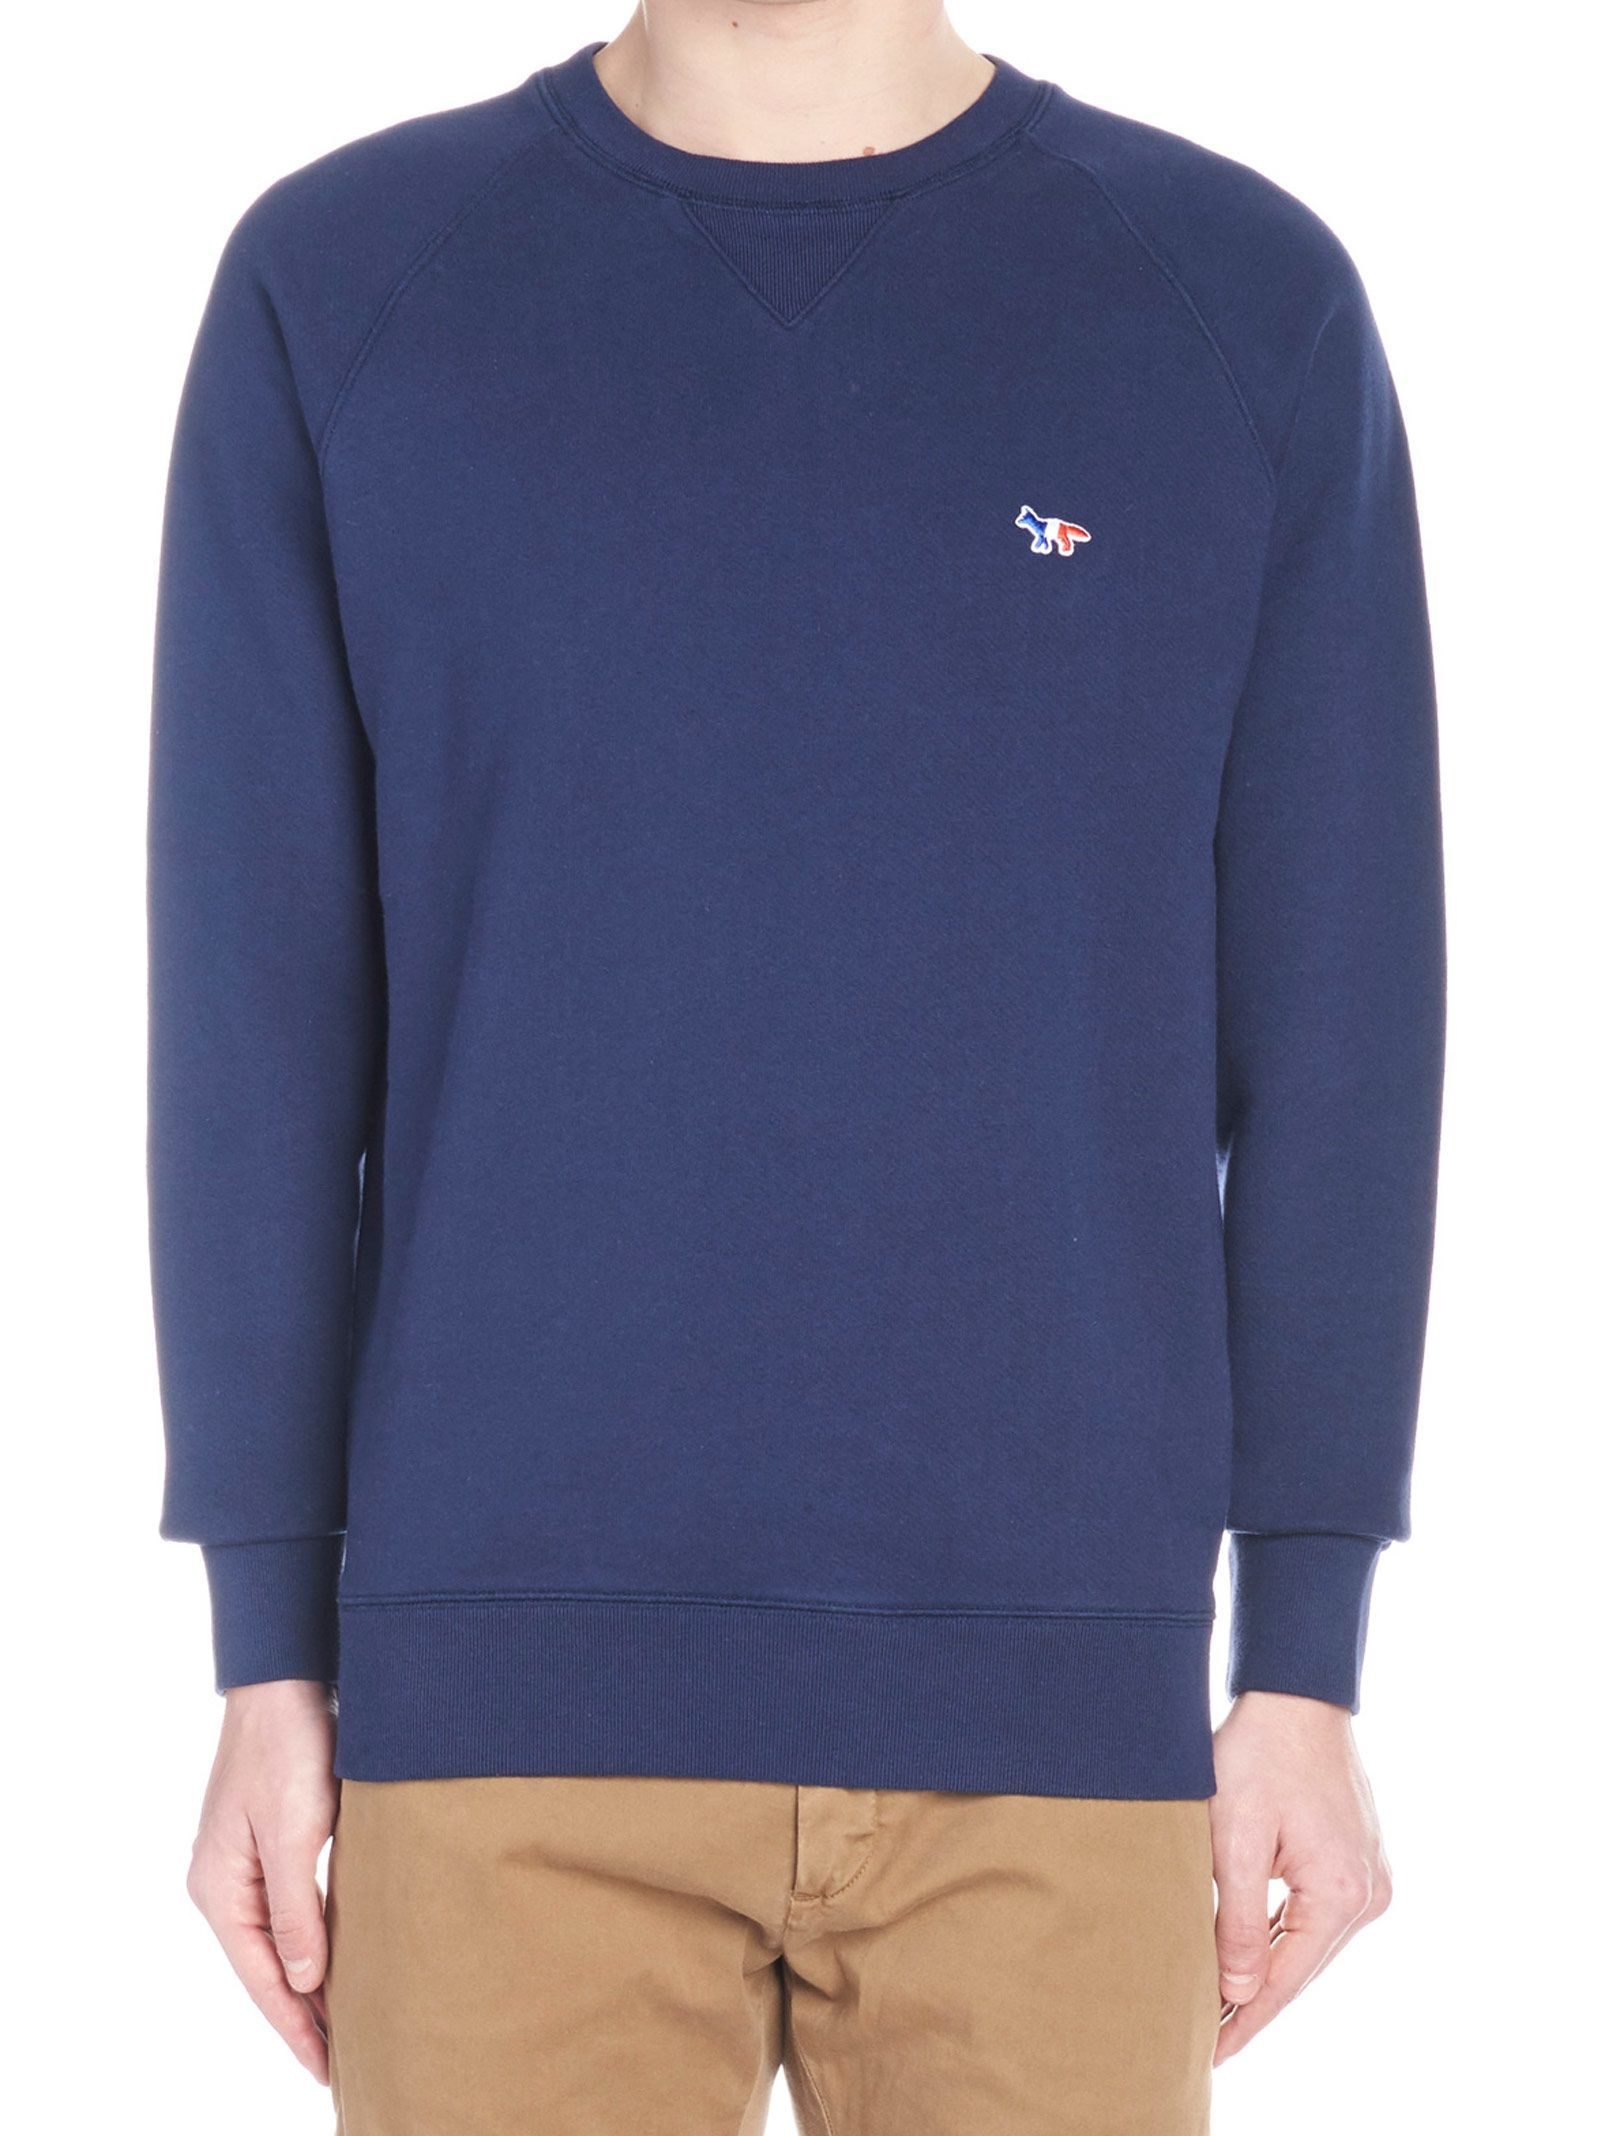 Maison Kitsune Sweatshirt Maisonkitsune Cloth Maison Kitsune Long Sleeve Tshirt Men Sweatshirts [ 2136 x 1600 Pixel ]